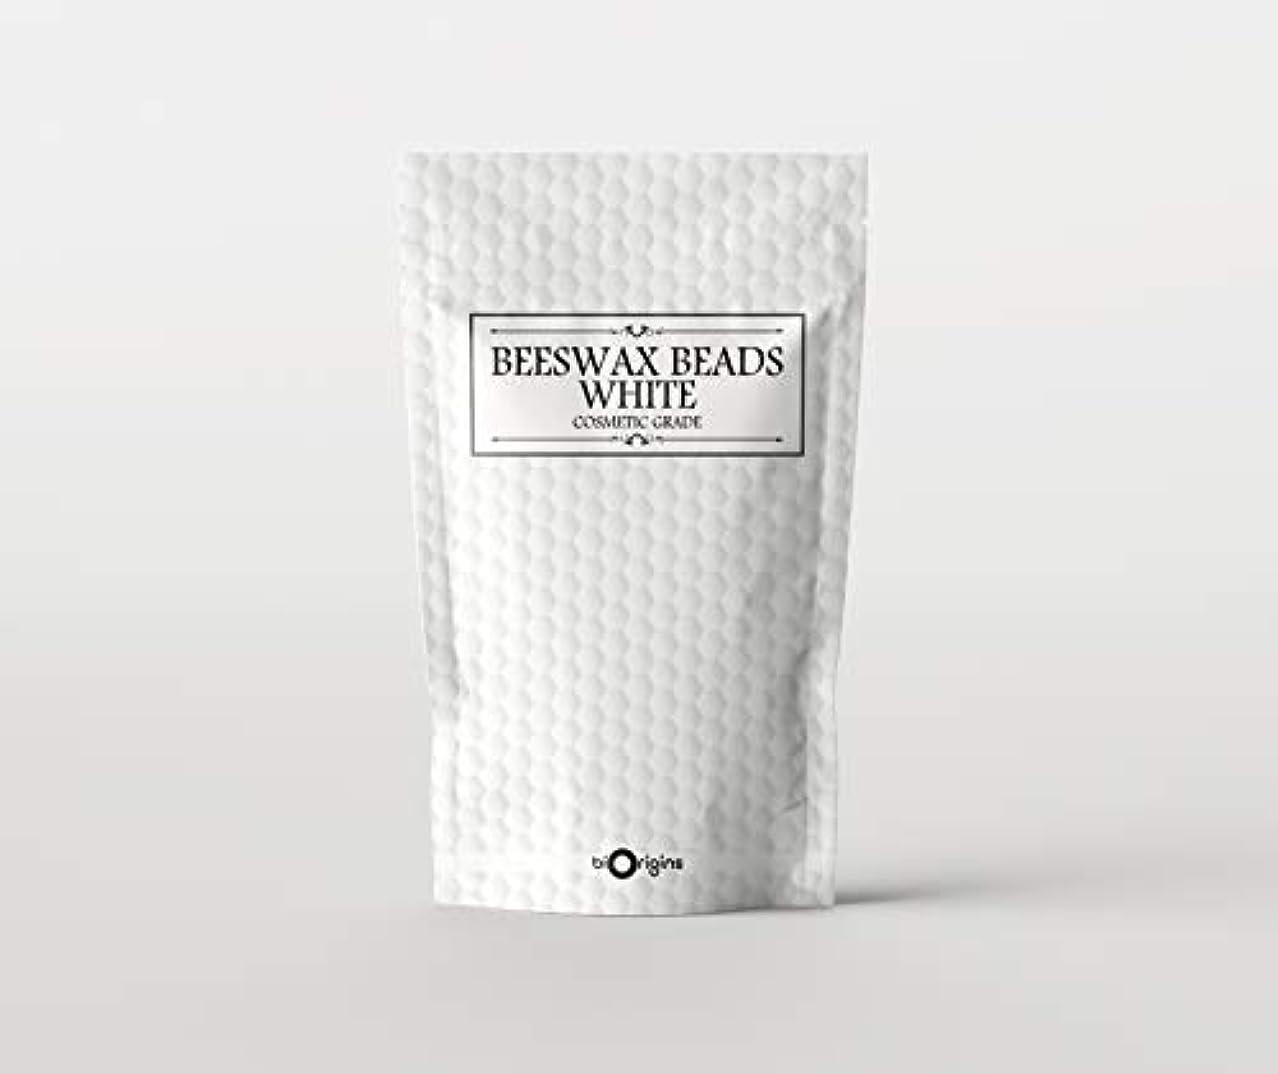 排出敵白内障Beeswax Beads White - Cosmetic Grade - 500g